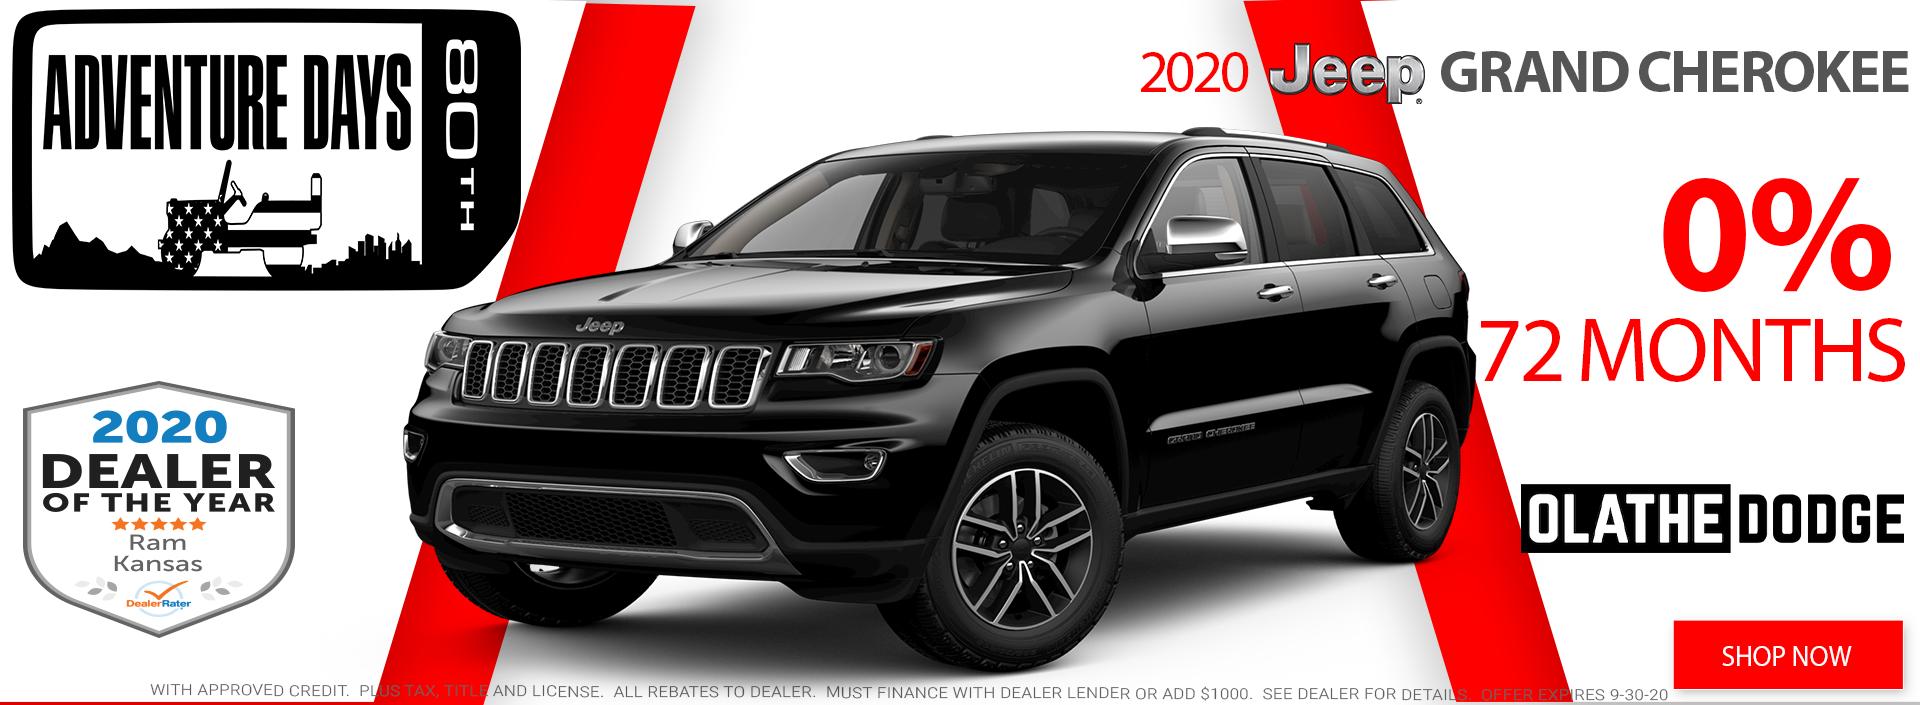 09.04.2020 — Olathe Dodge — 2020 jeep grand cherokee 1920×705